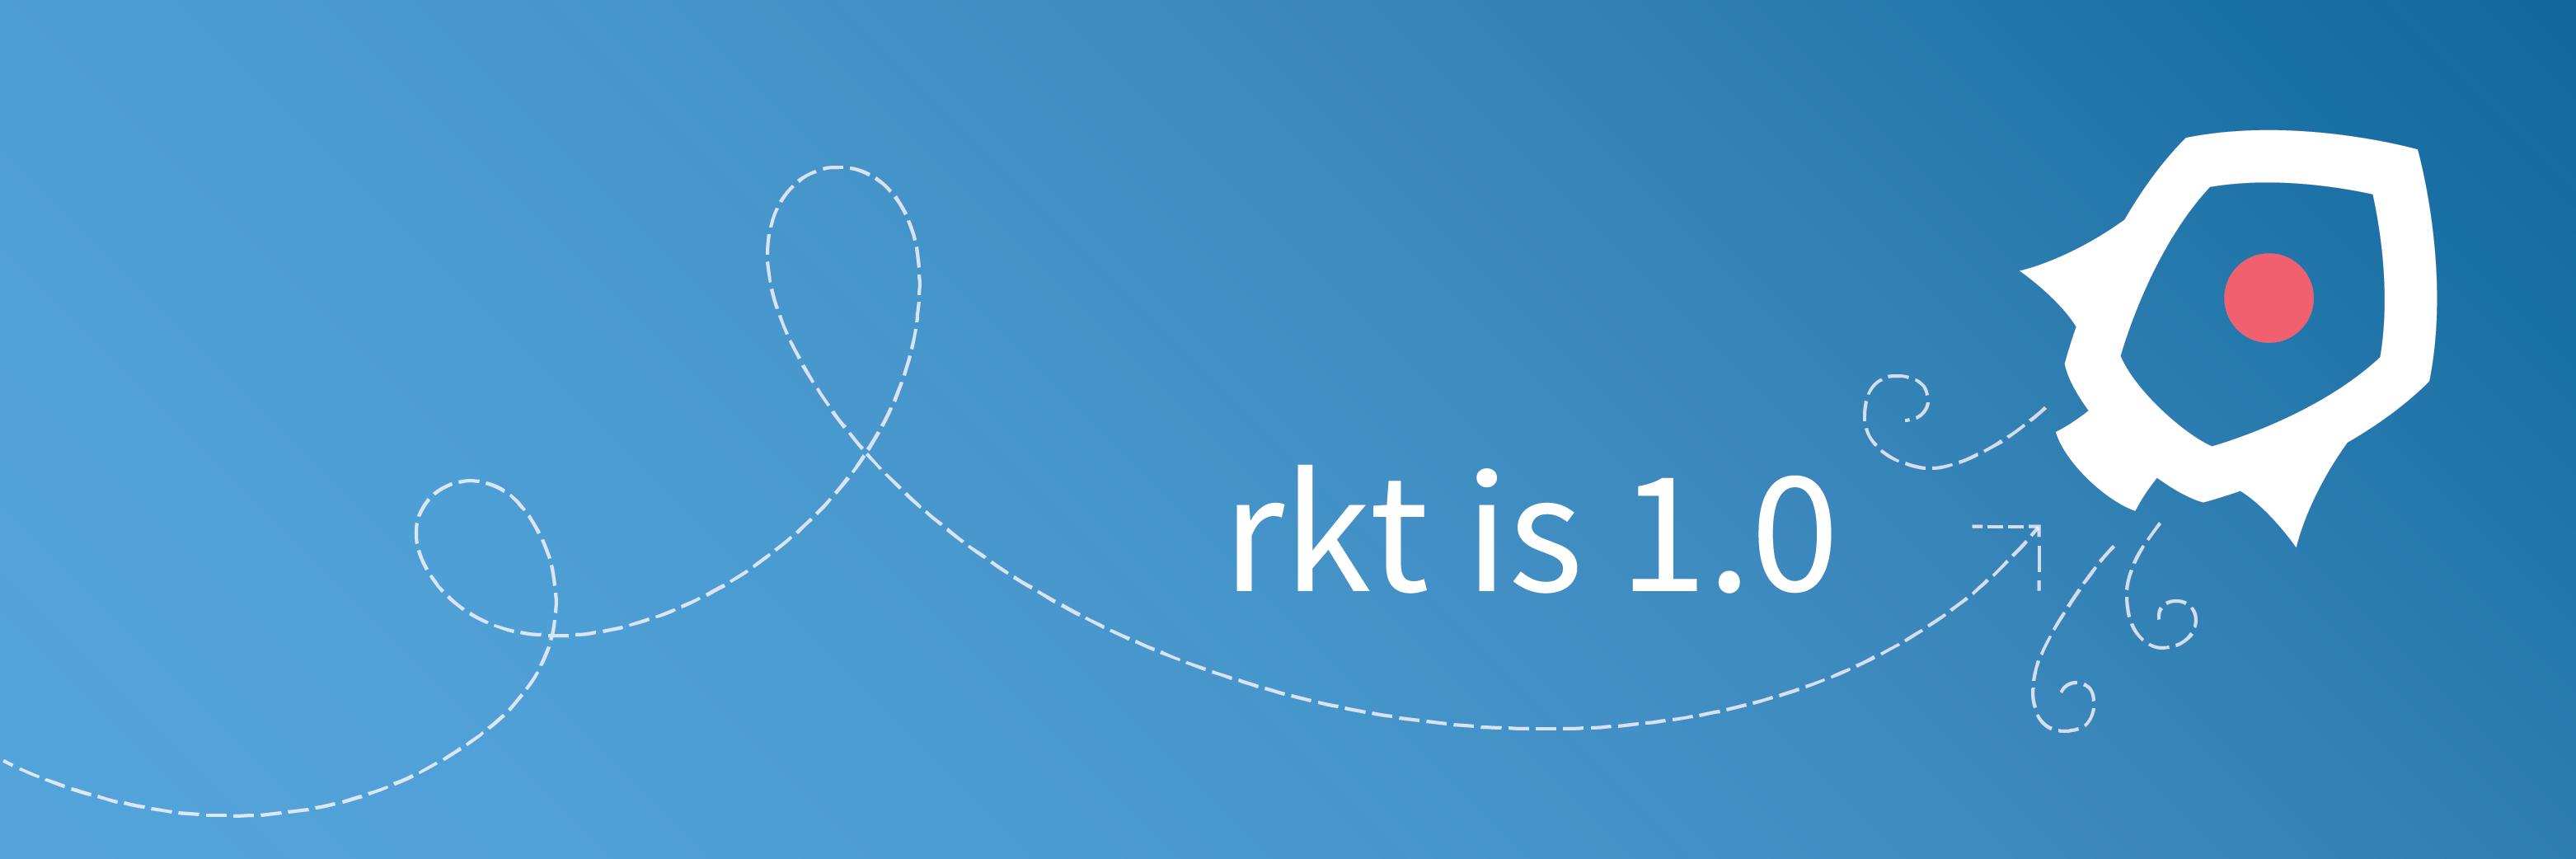 rkt-1 0-banner